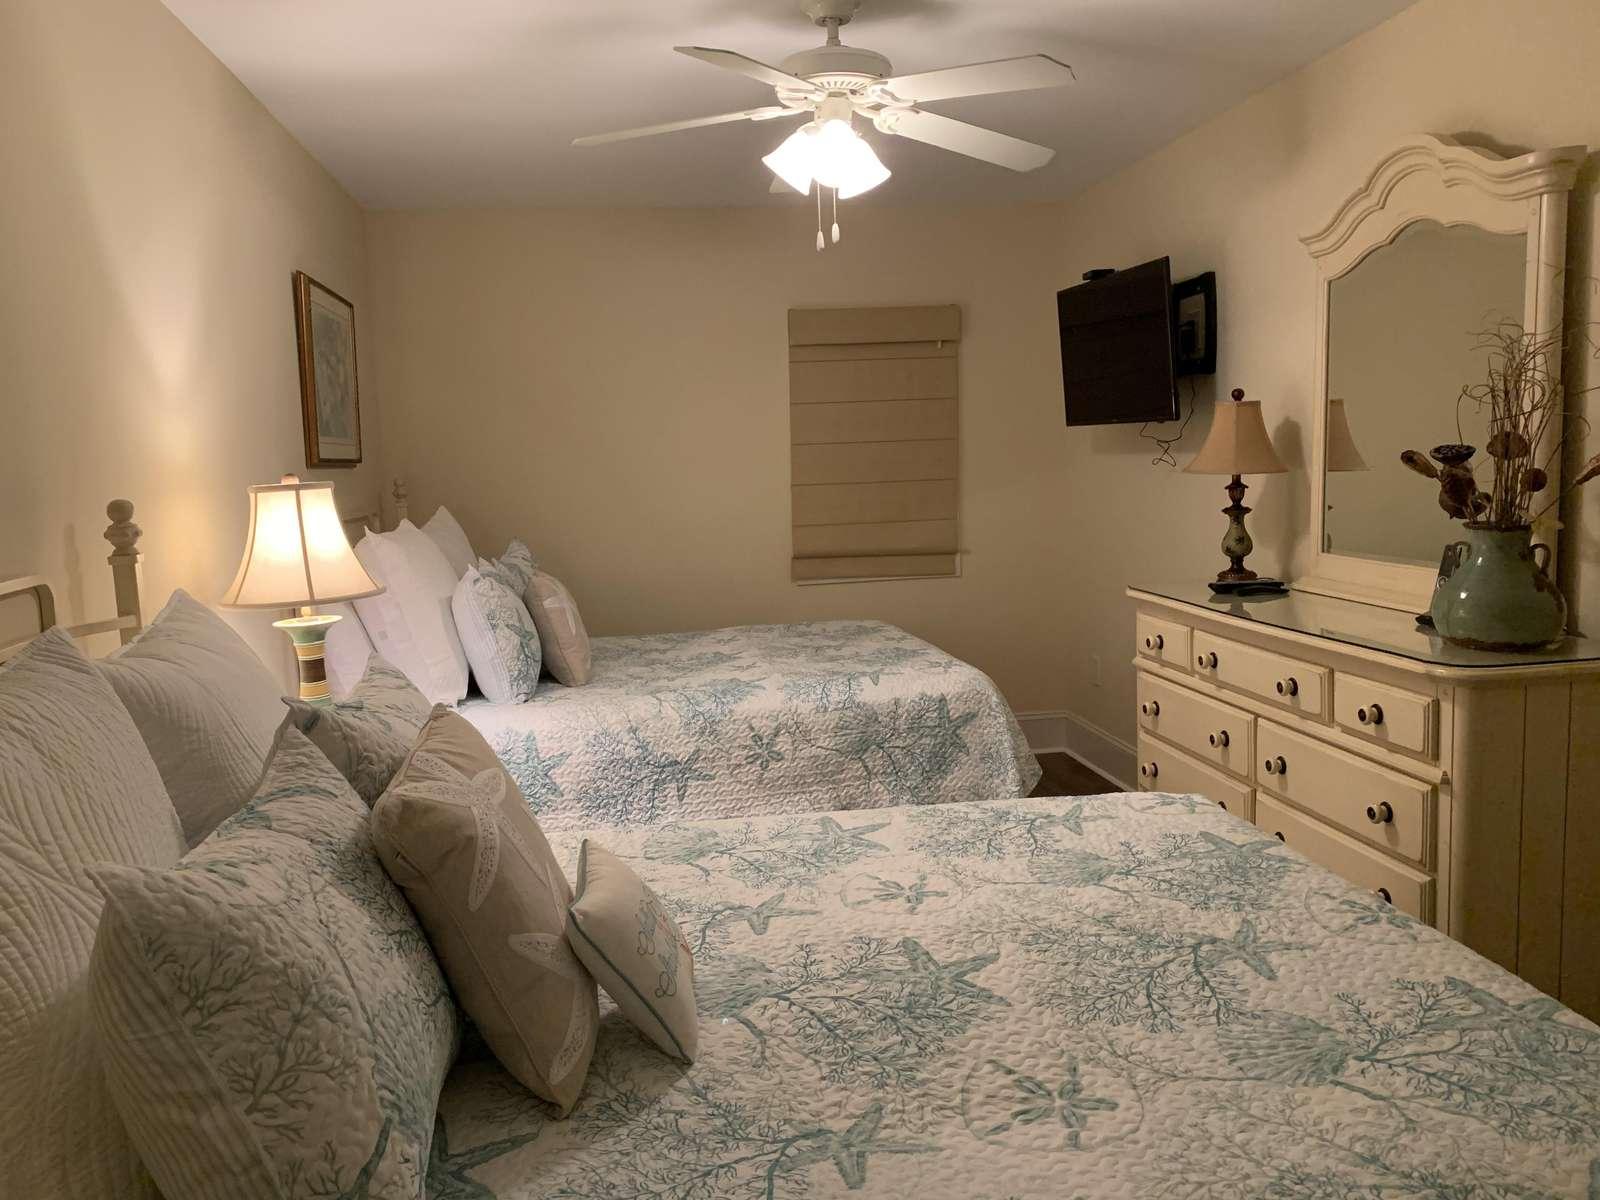 Guest bedroom, flat screen TV